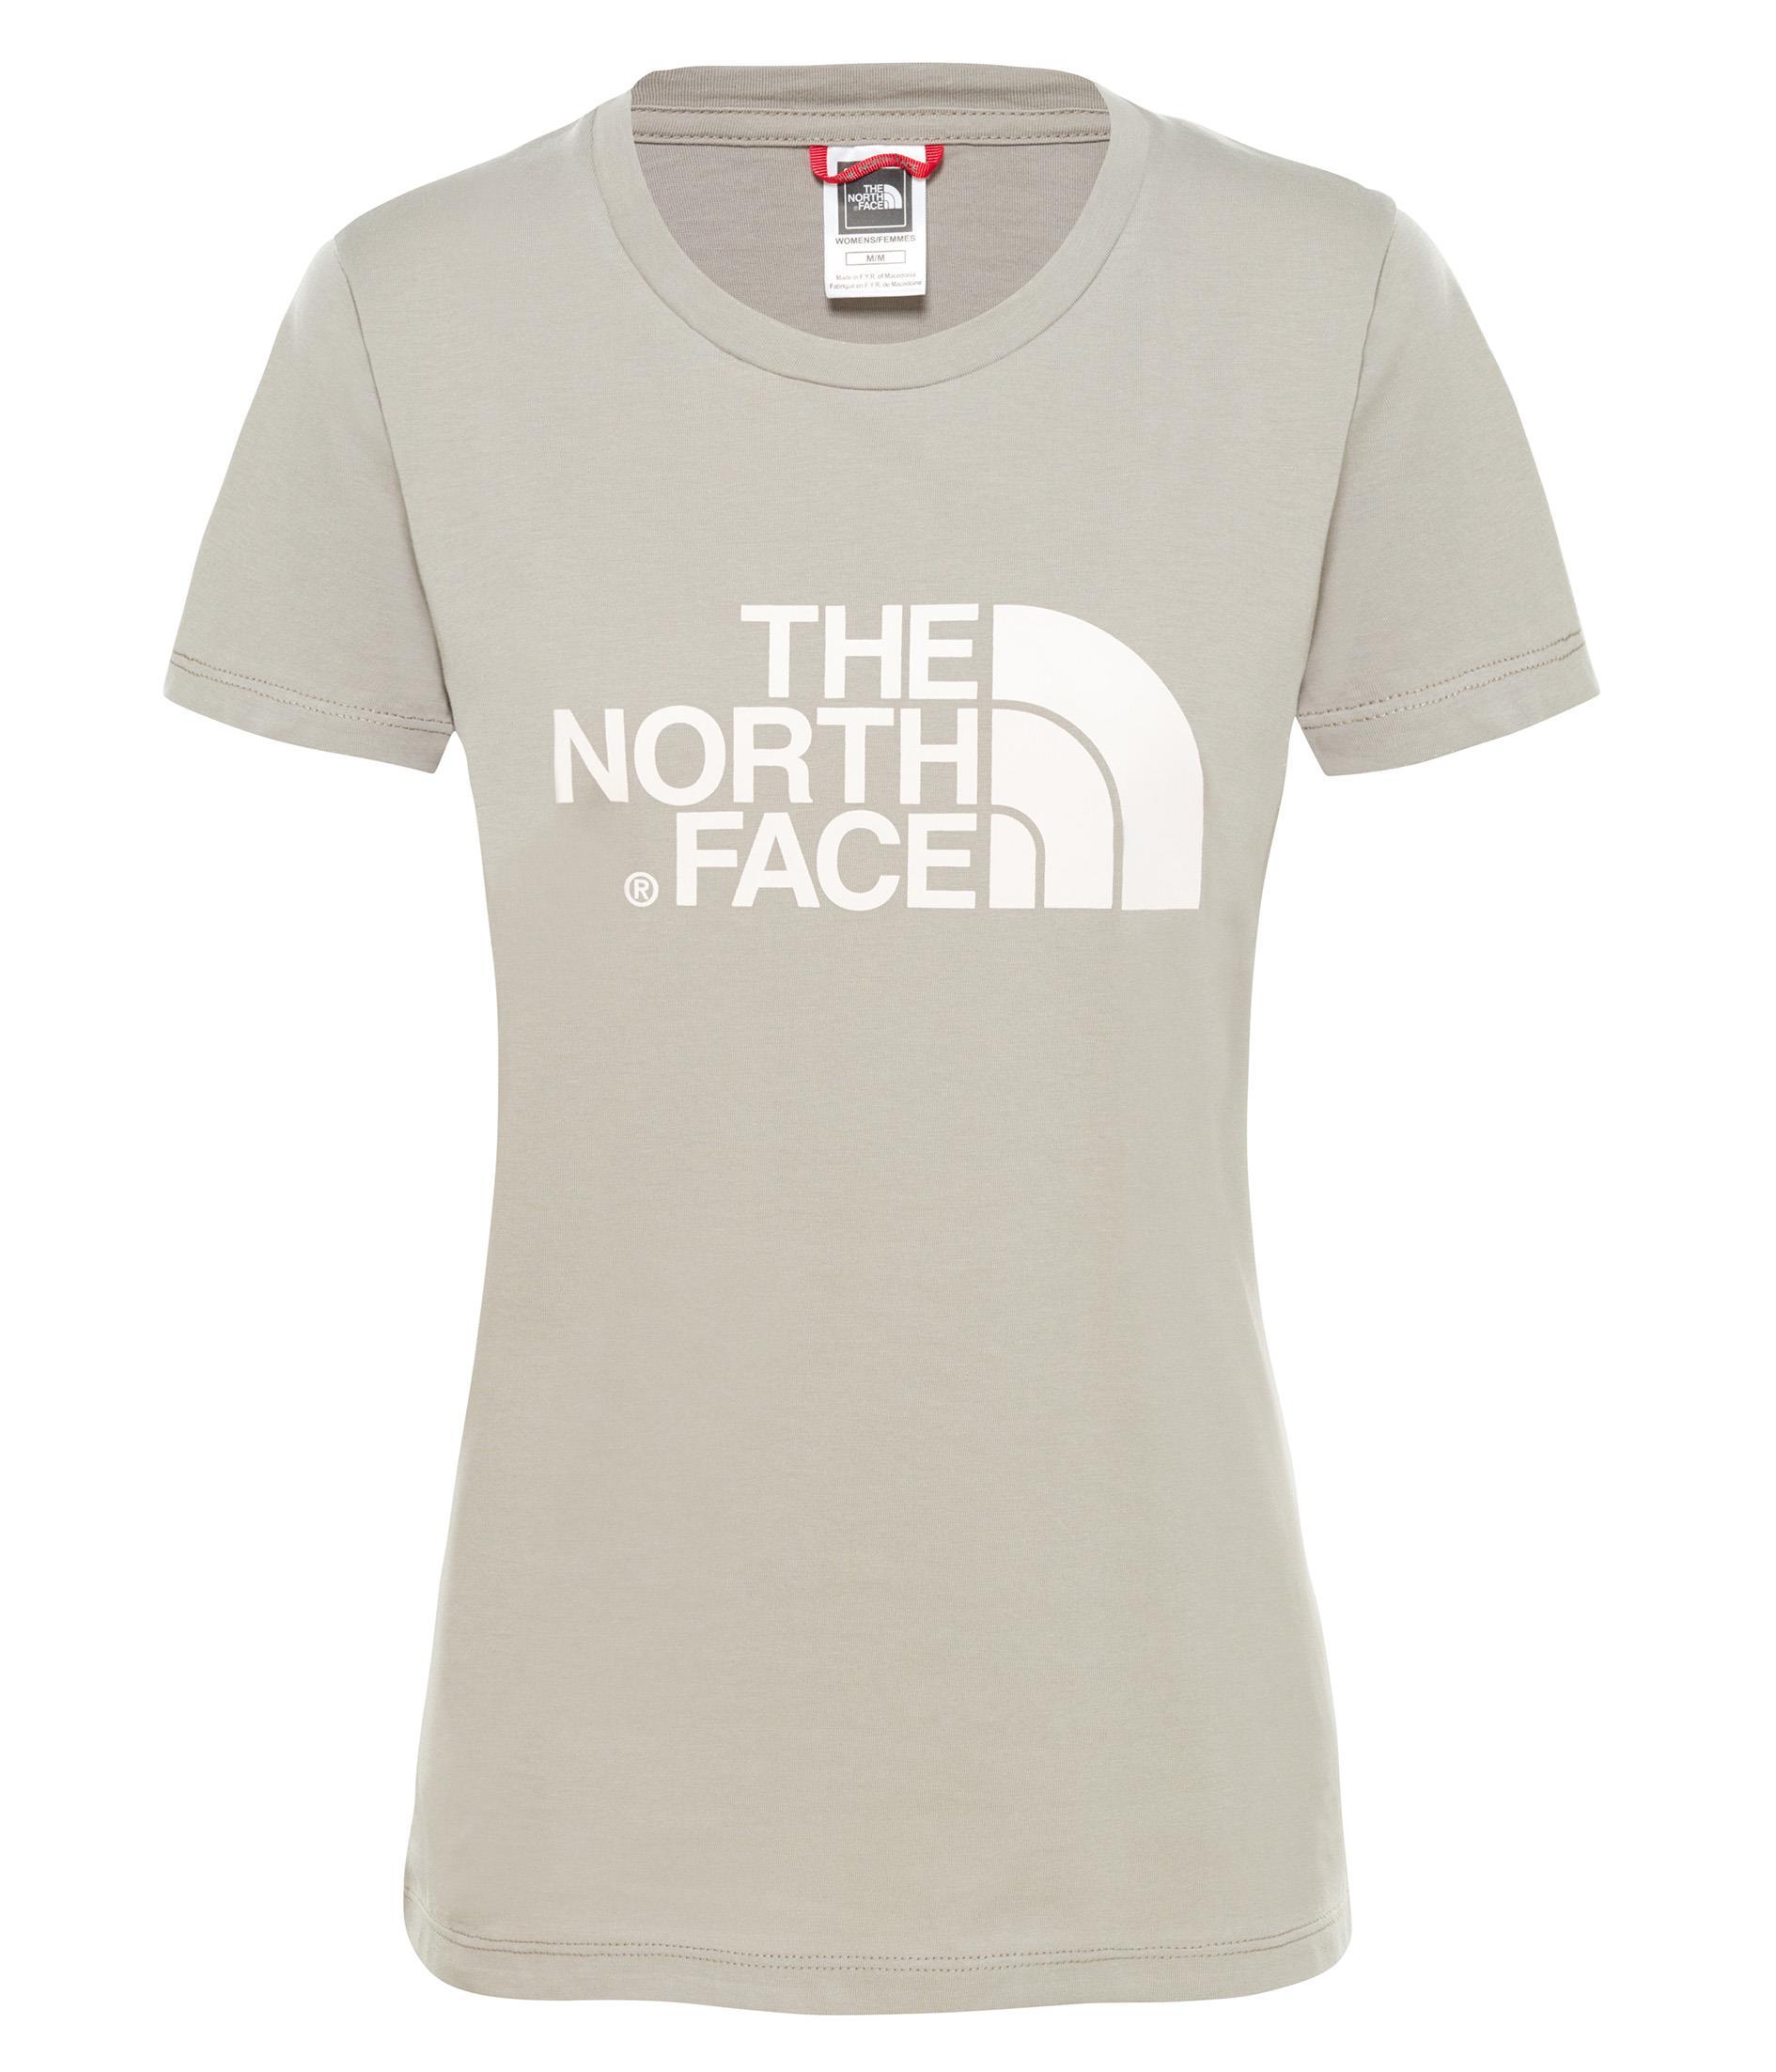 The Northface Kadın S/S Easy Tee - Eu T0C256Ecs Tişört